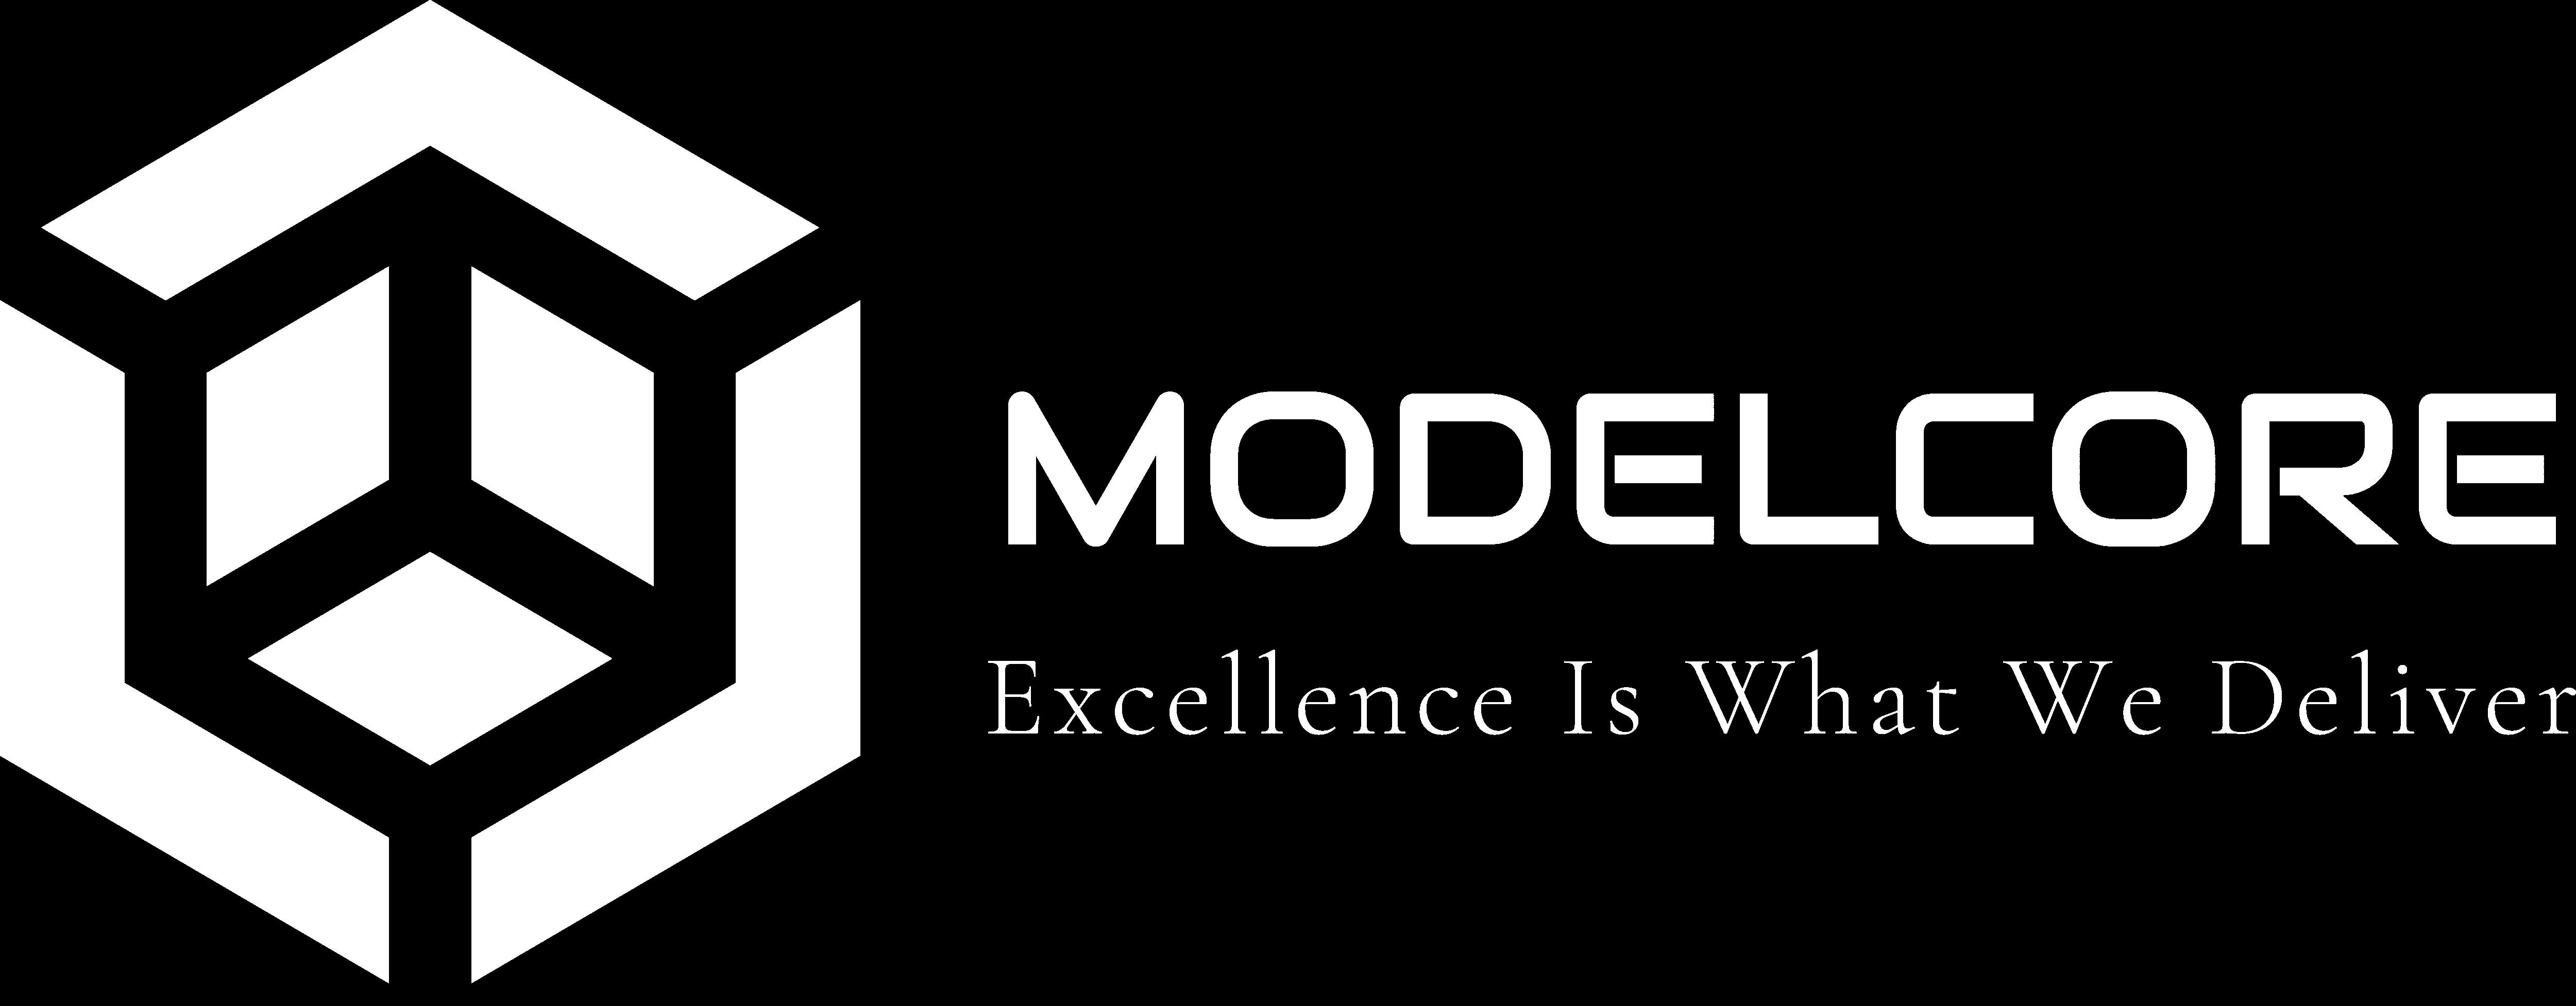 Modelcore Inc.